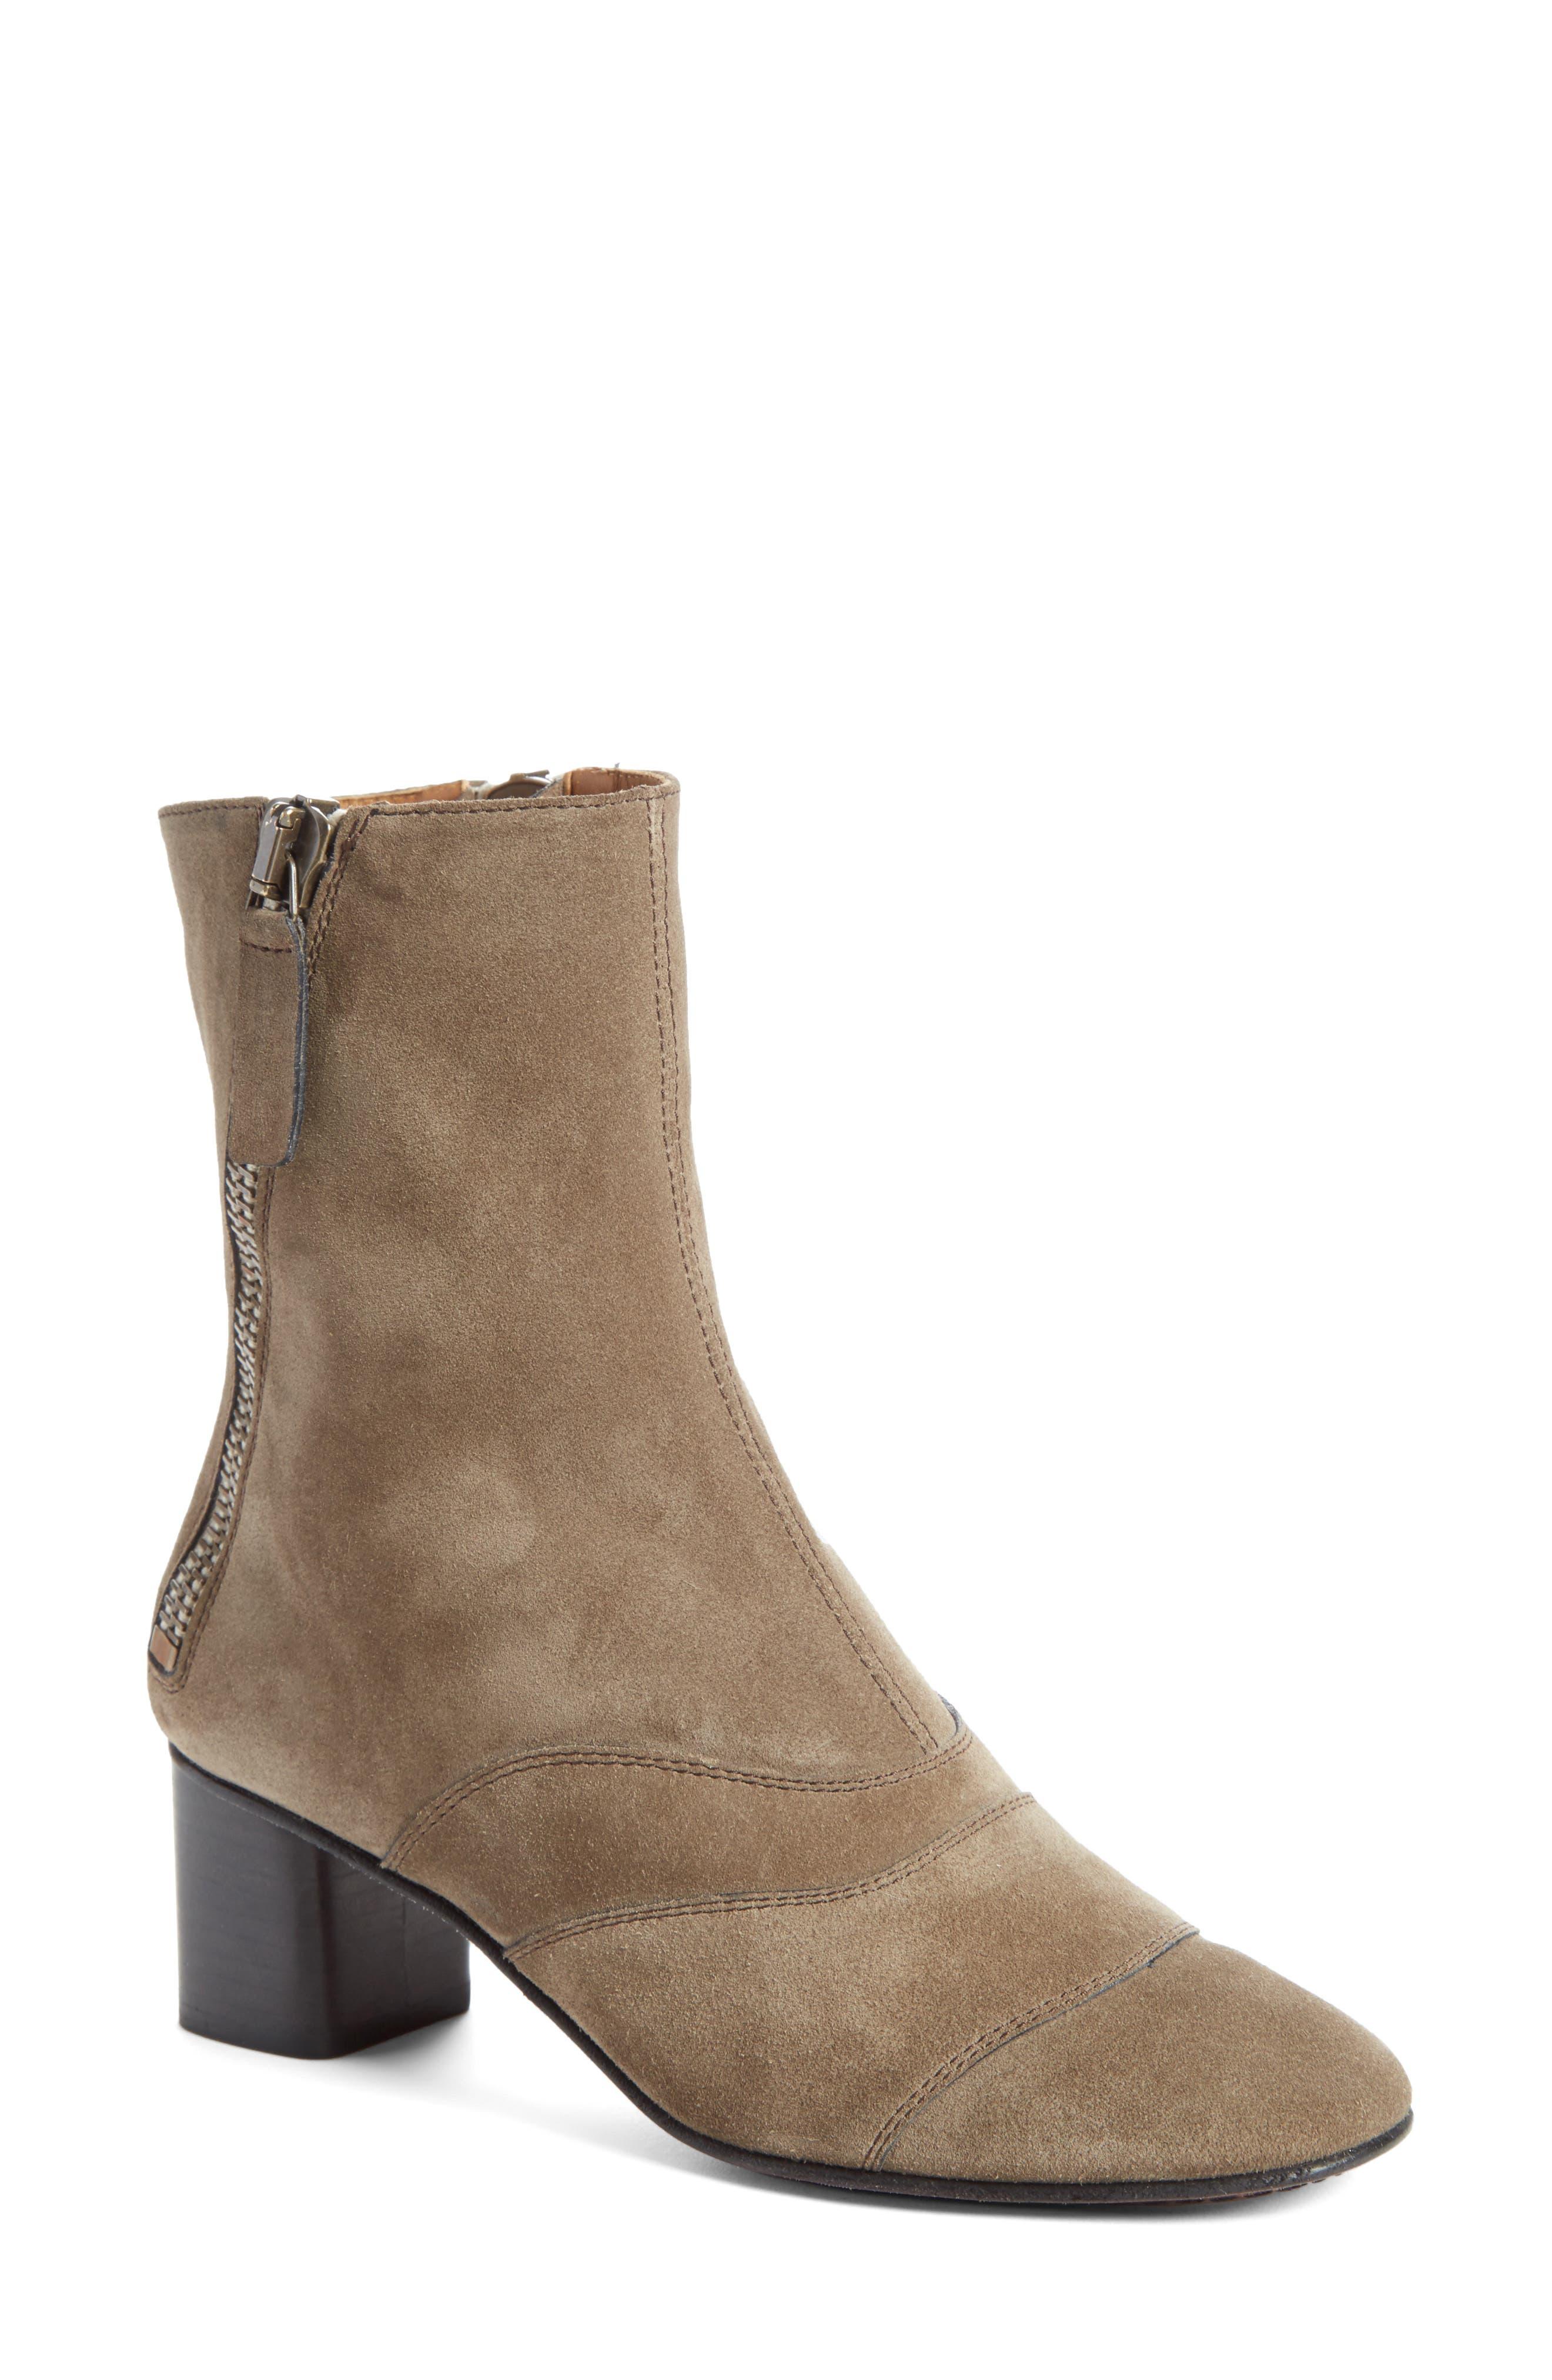 Lexie Block Heel Boot,                         Main,                         color, Dark Greige